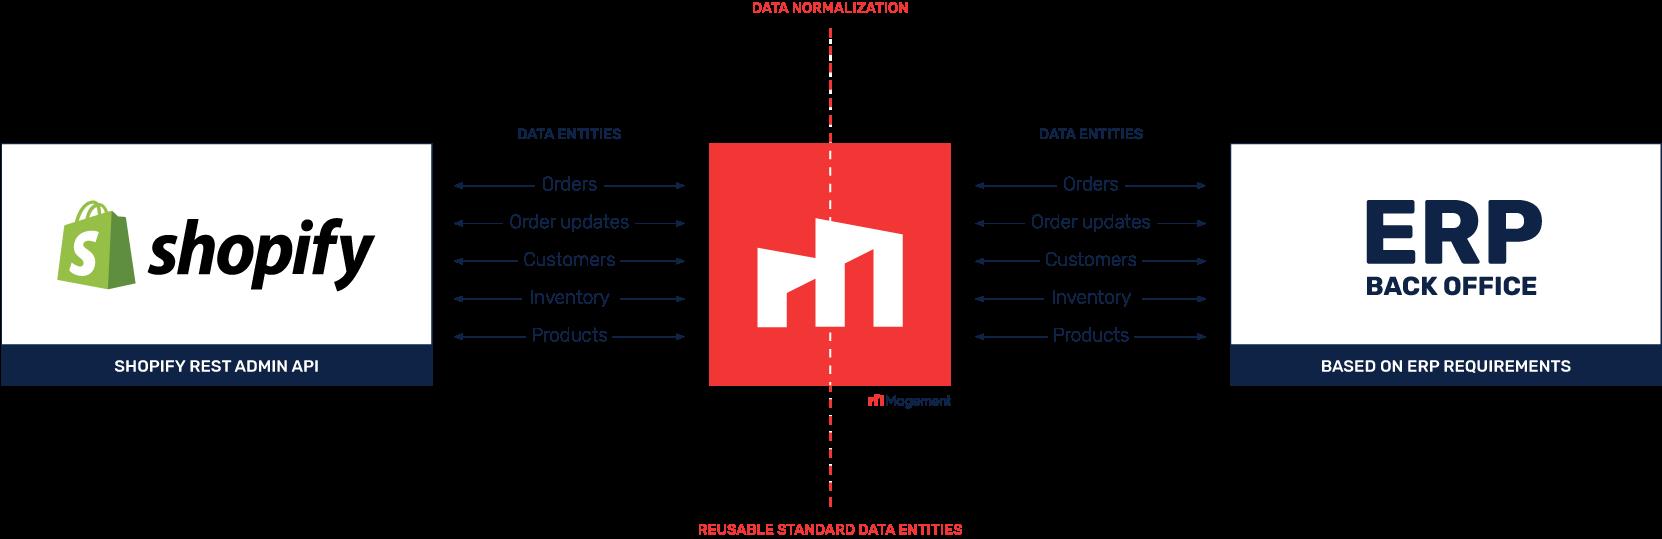 Magement-Shopify-ERP-integration-Data-Streams.png